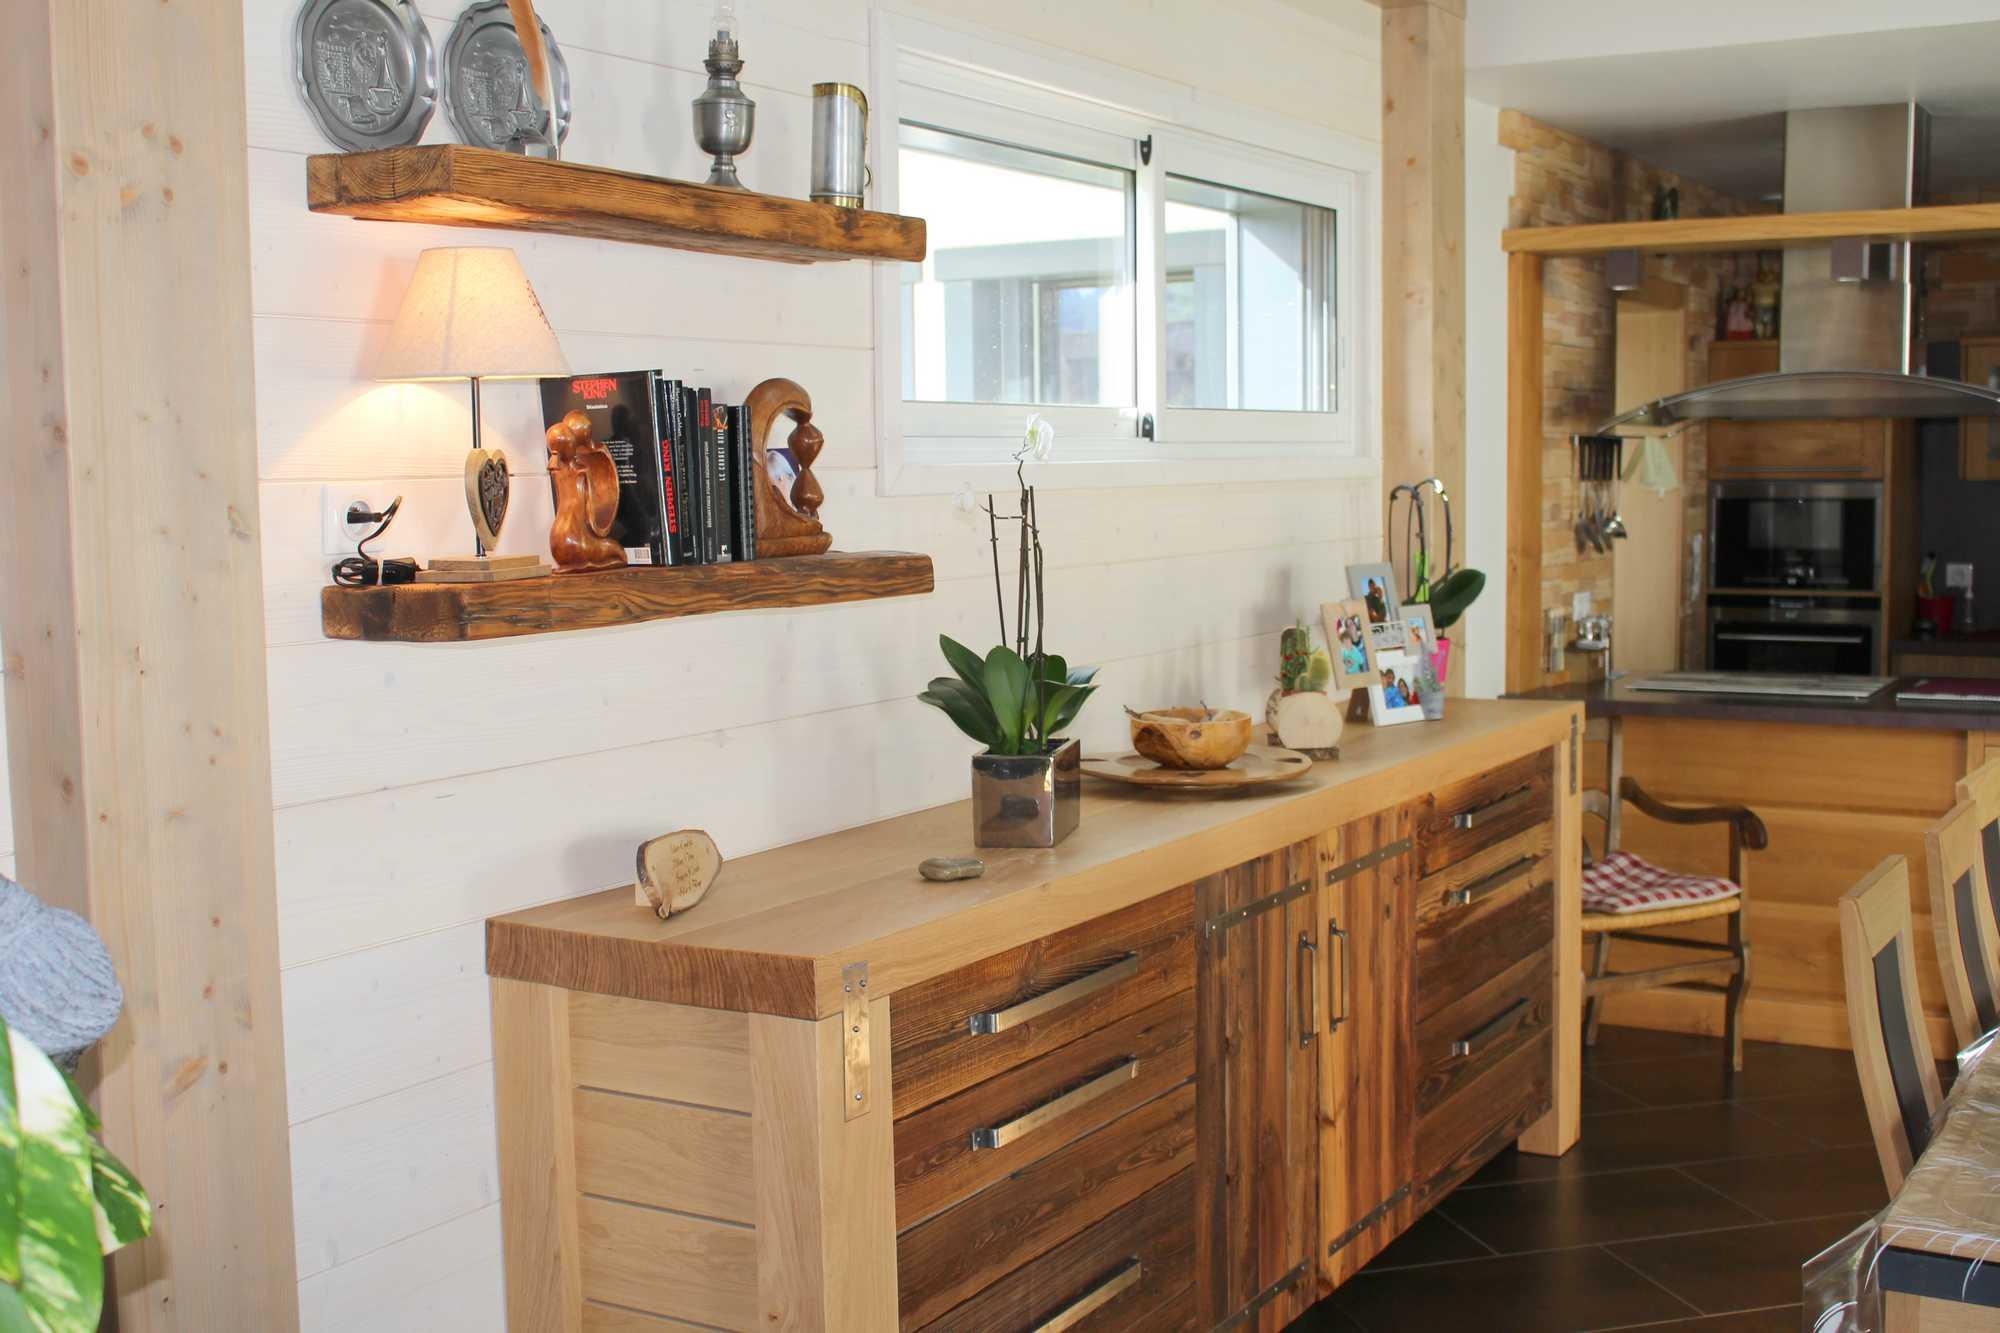 cuisines bois contemporainesmenuiserie agencement gerard. Black Bedroom Furniture Sets. Home Design Ideas